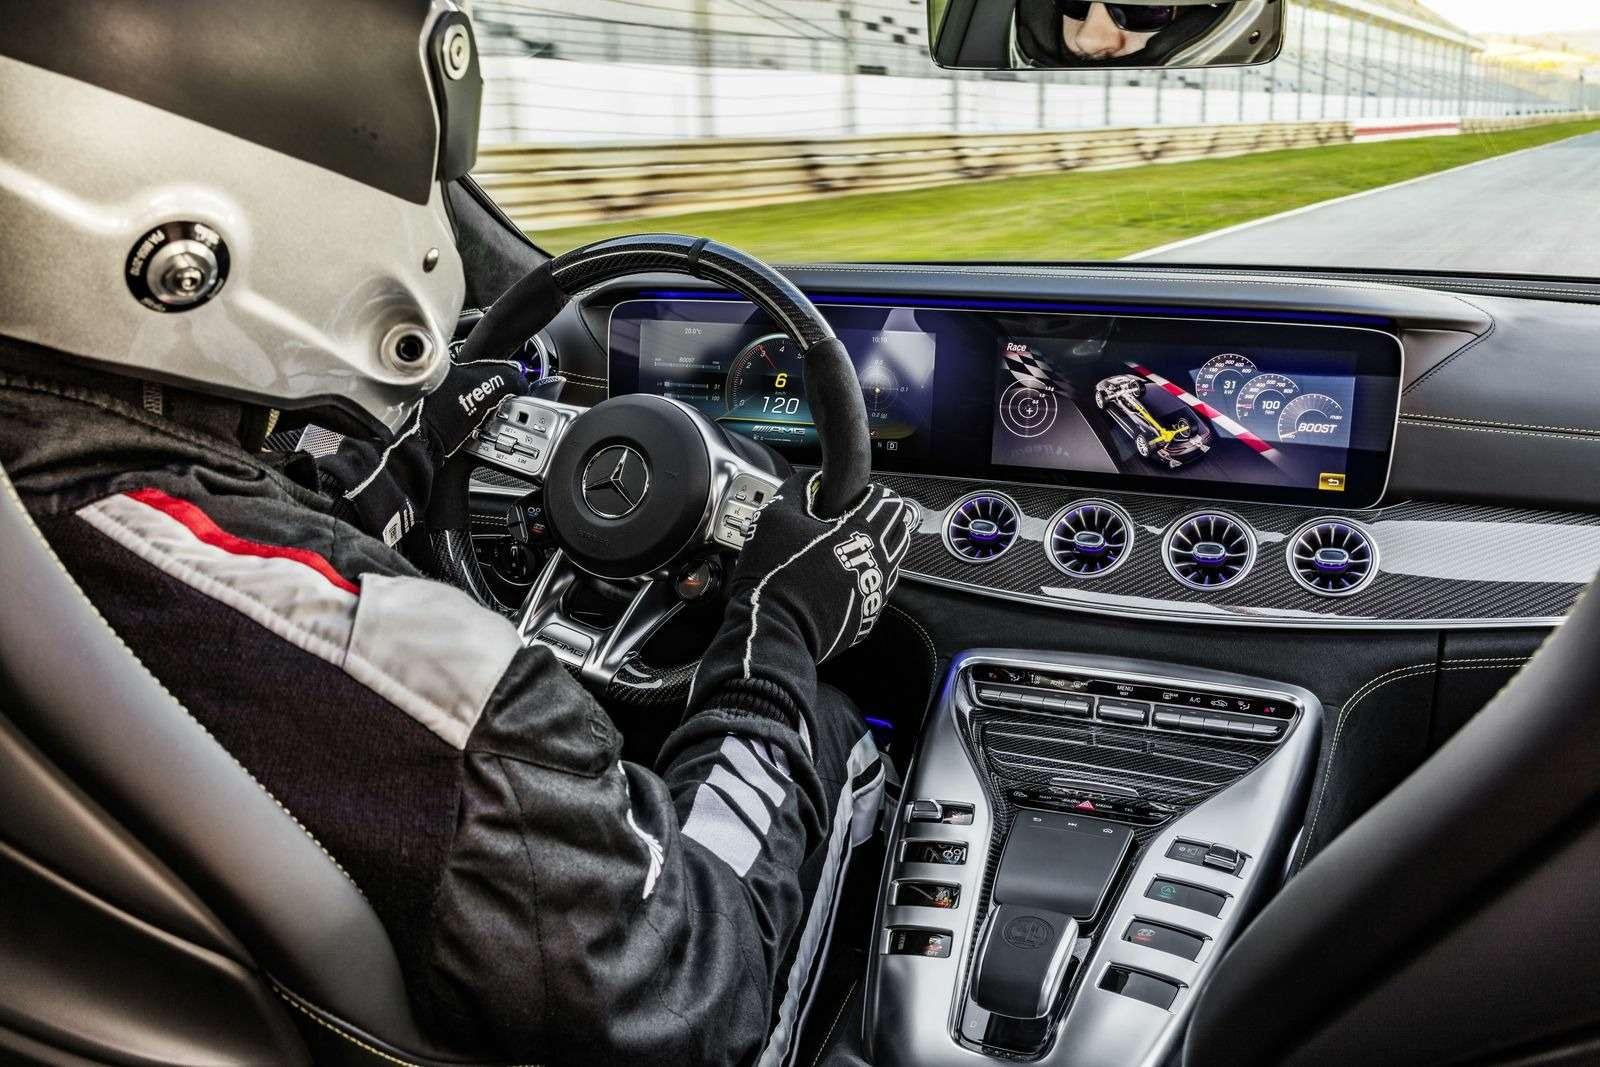 Подмена! Пятидверный Mercedes-AMG GTполучил «тележку» Е-класса— фото 851525